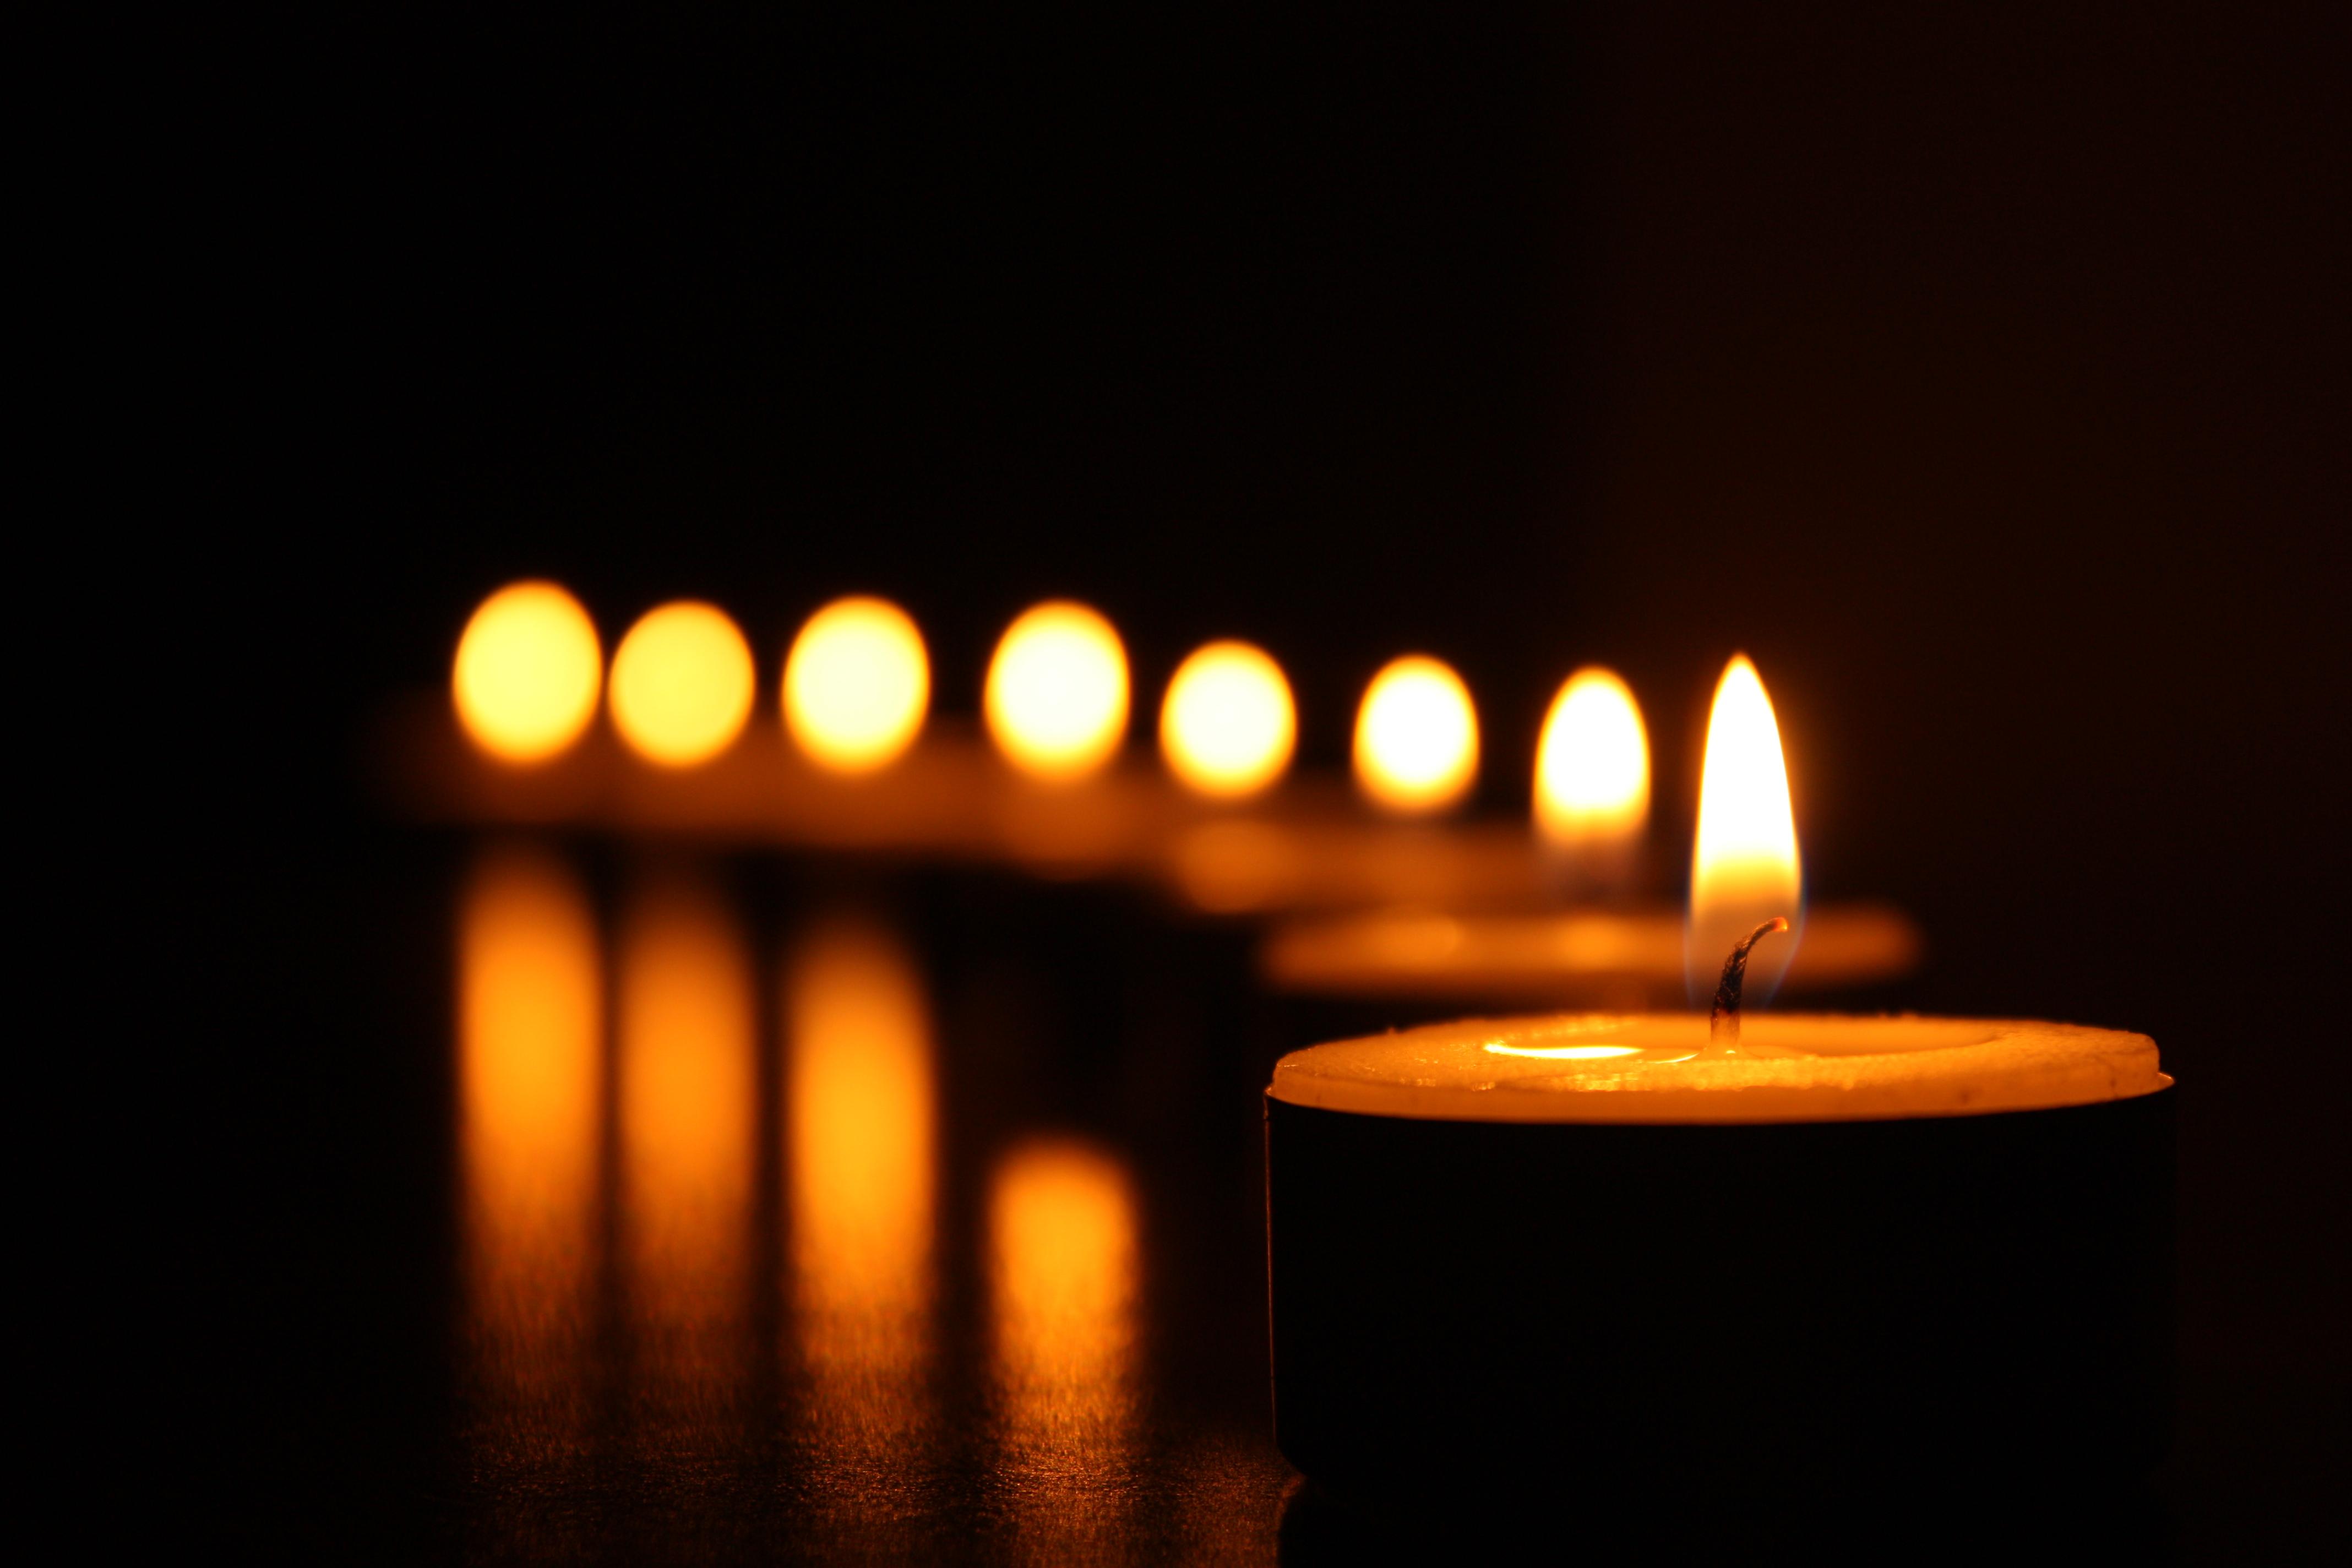 Hd Wallpaper Diwali Light 100 Kerzenlicht Fotos 183 Pexels 183 Kostenlose Stock Fotos